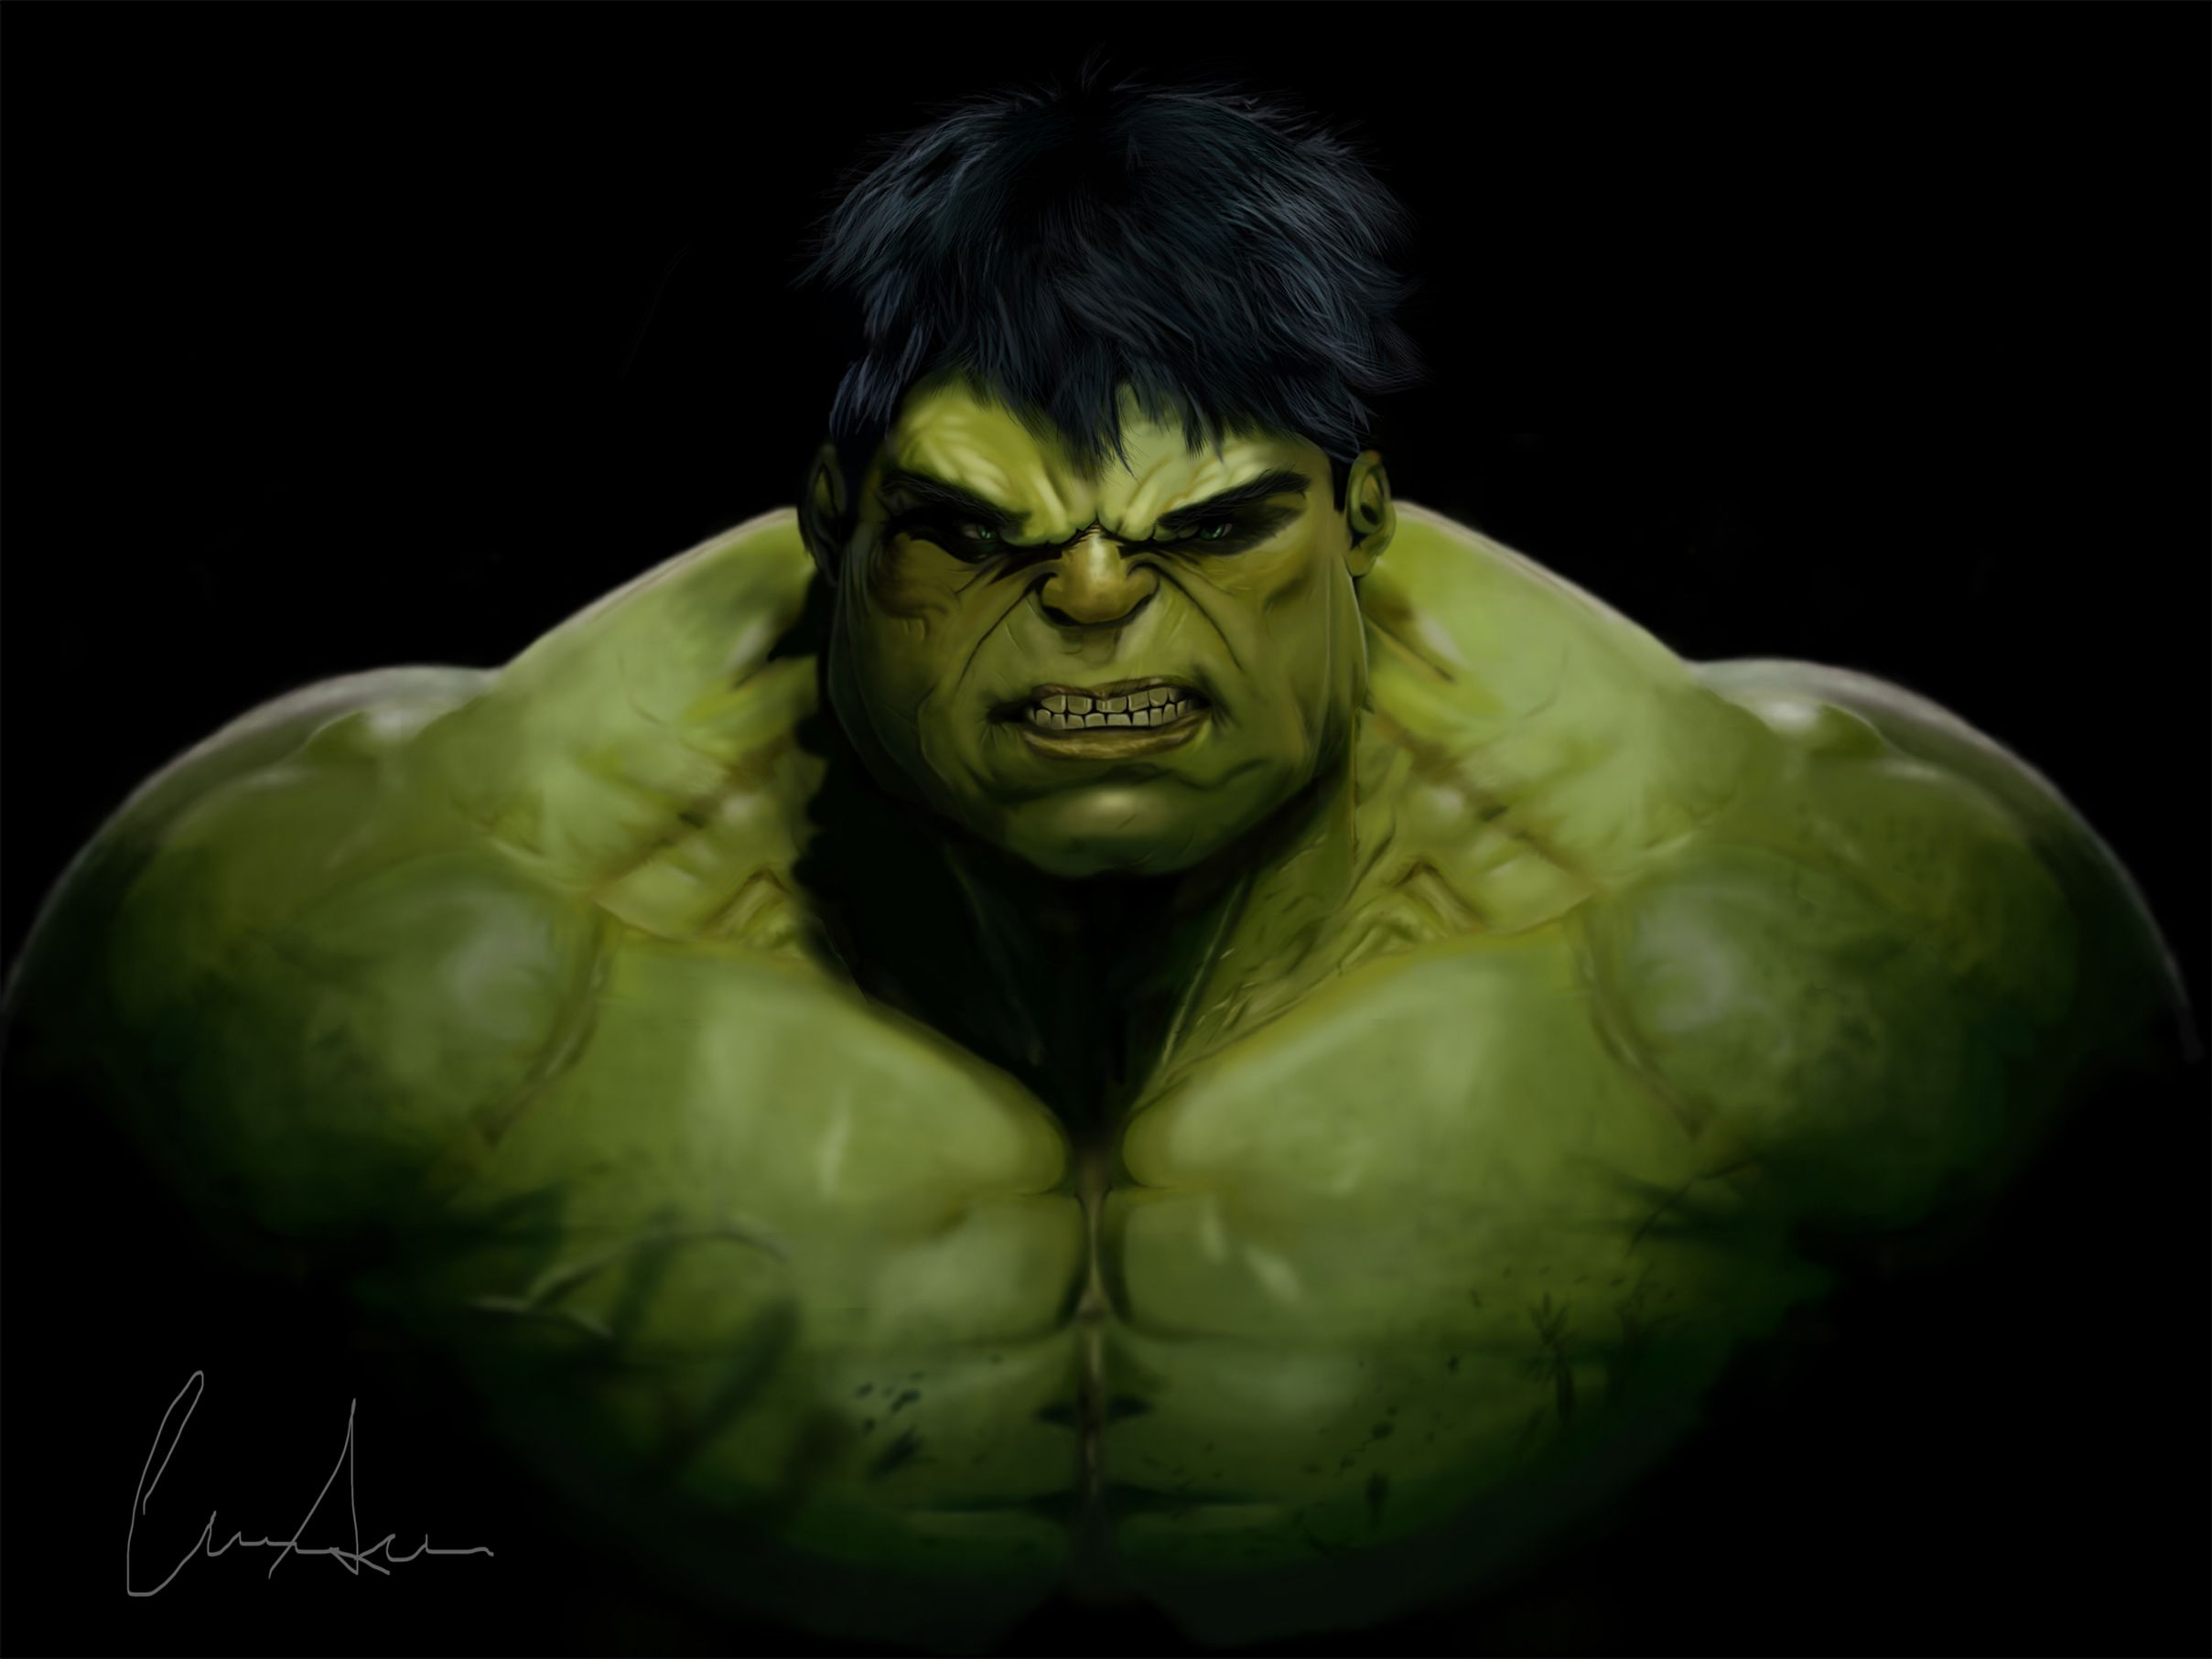 Cool Wallpaper Marvel The Incredible Hulk - cfaf20375b174658e5019aa88c950e3a  Gallery_13534.jpg